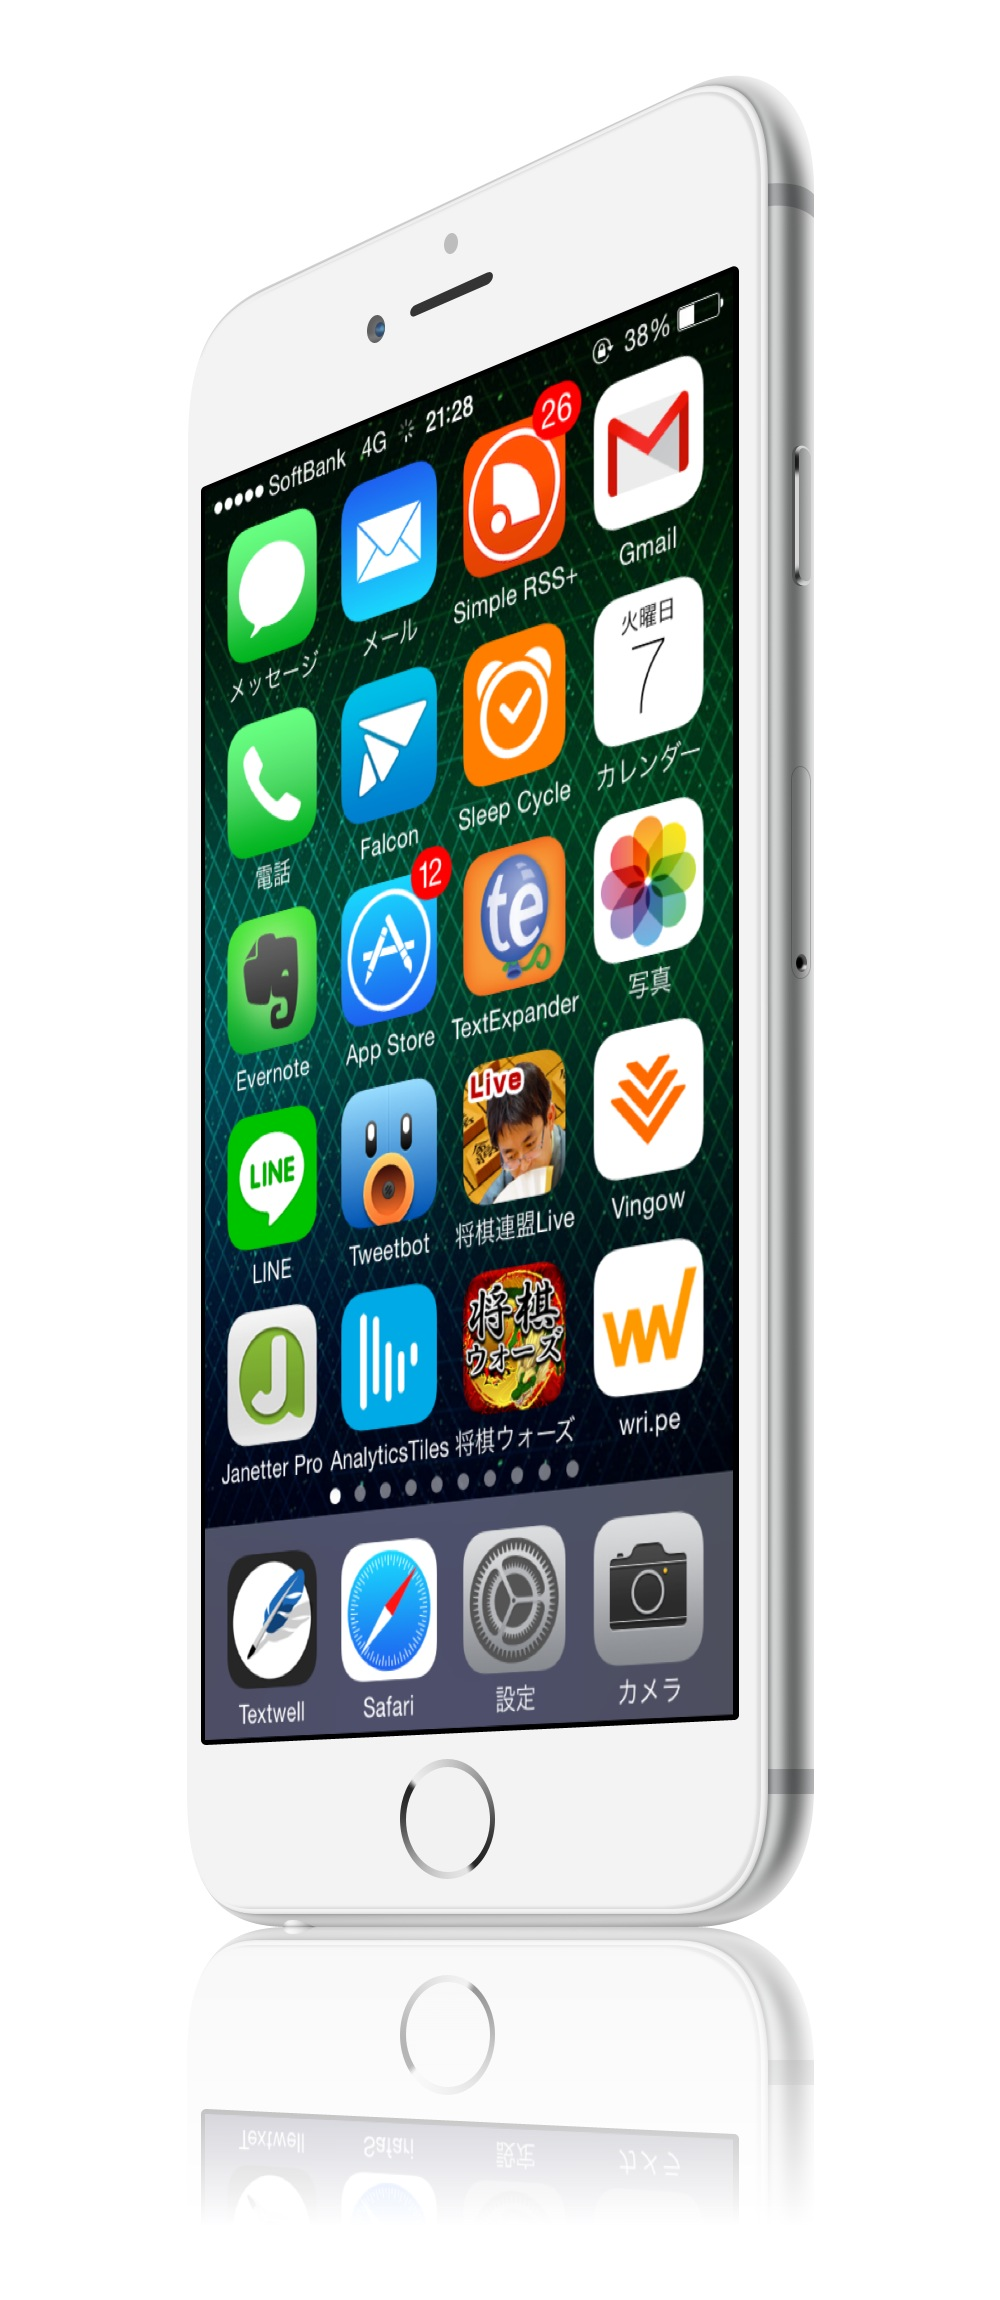 screenshotmakerpro